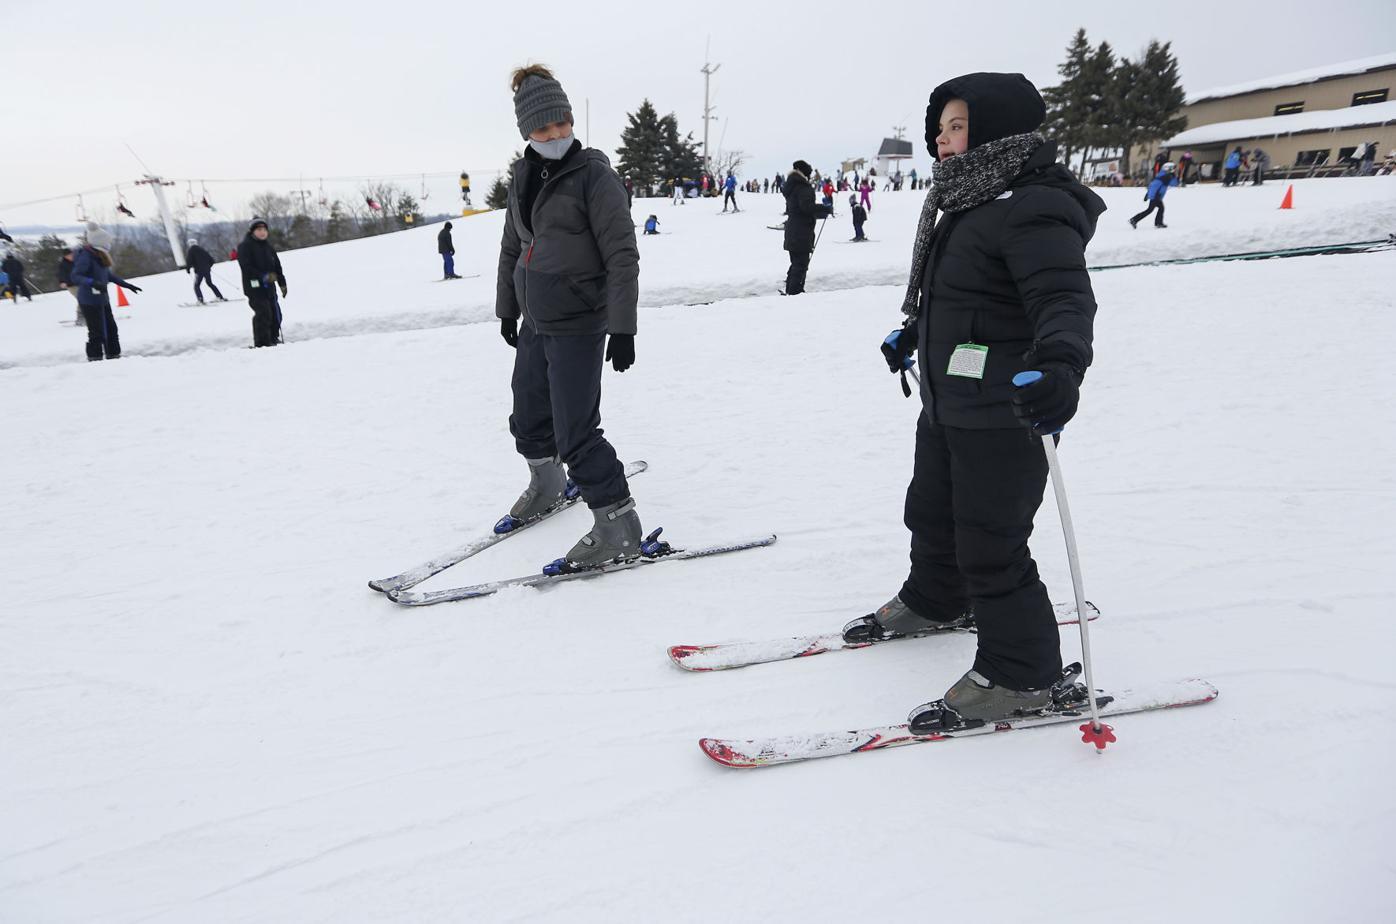 Adaptive skiing